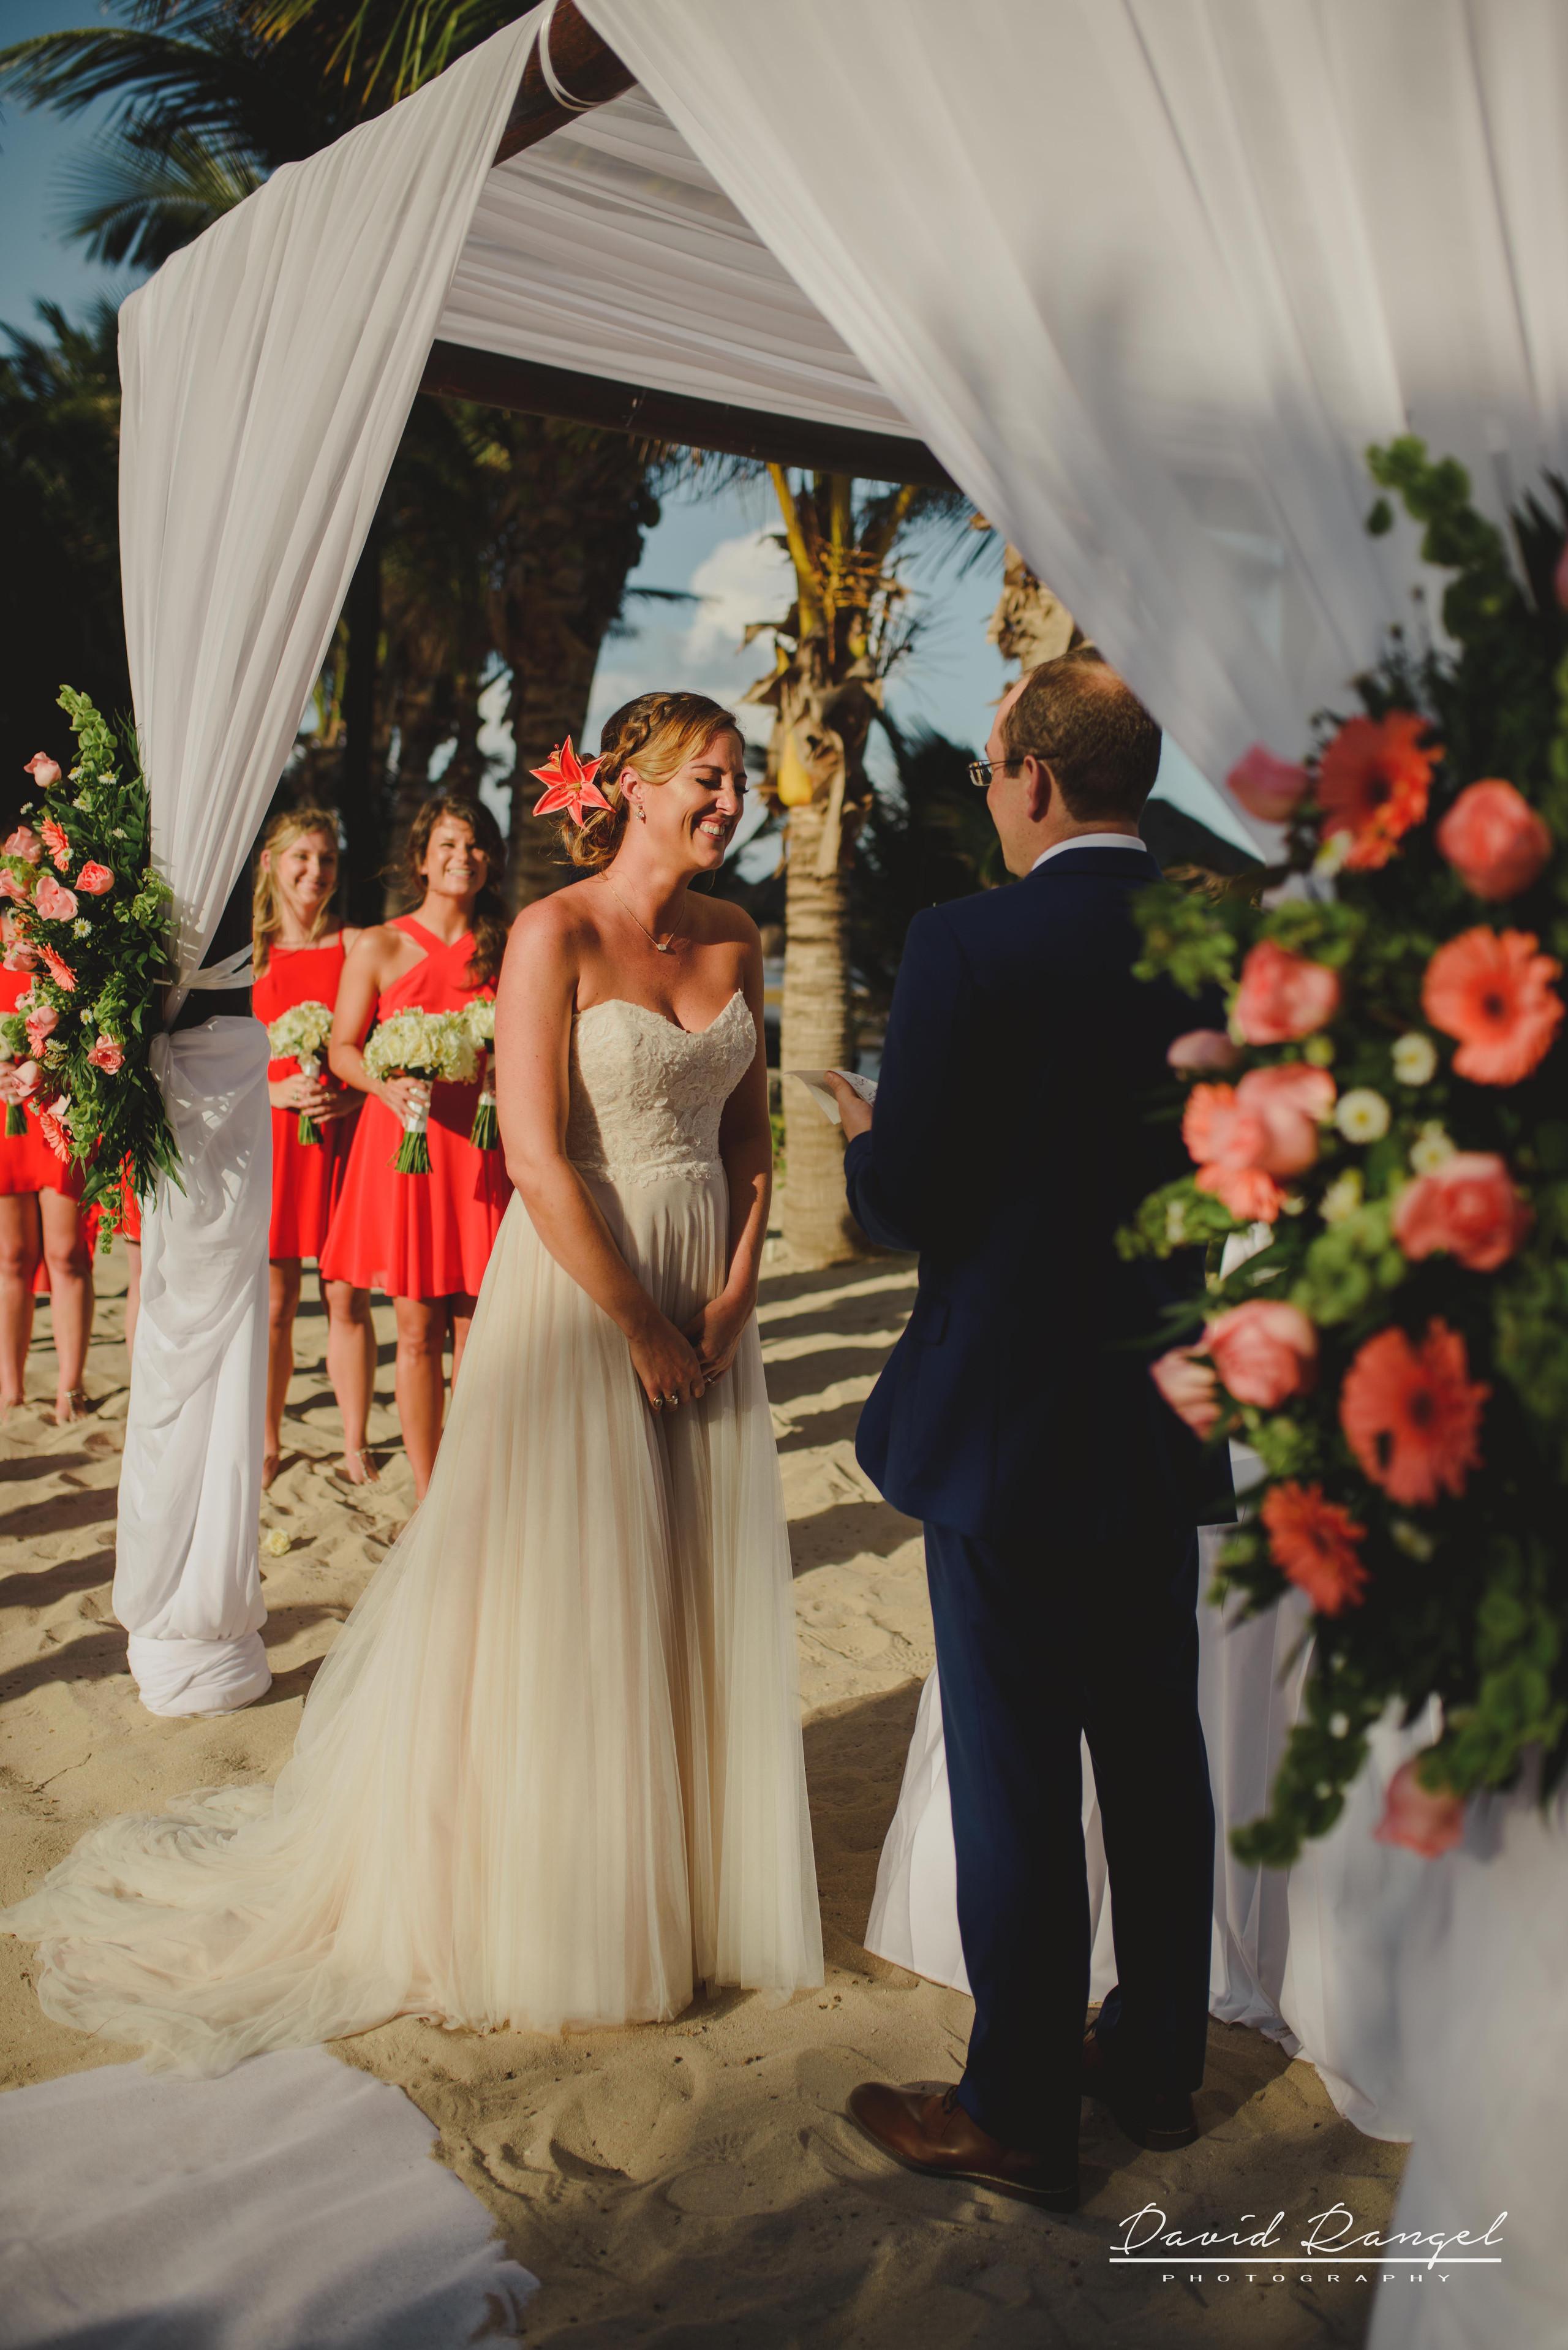 wedding+gazebo+beach+ceremony+photo+groom+bride+happy+smile